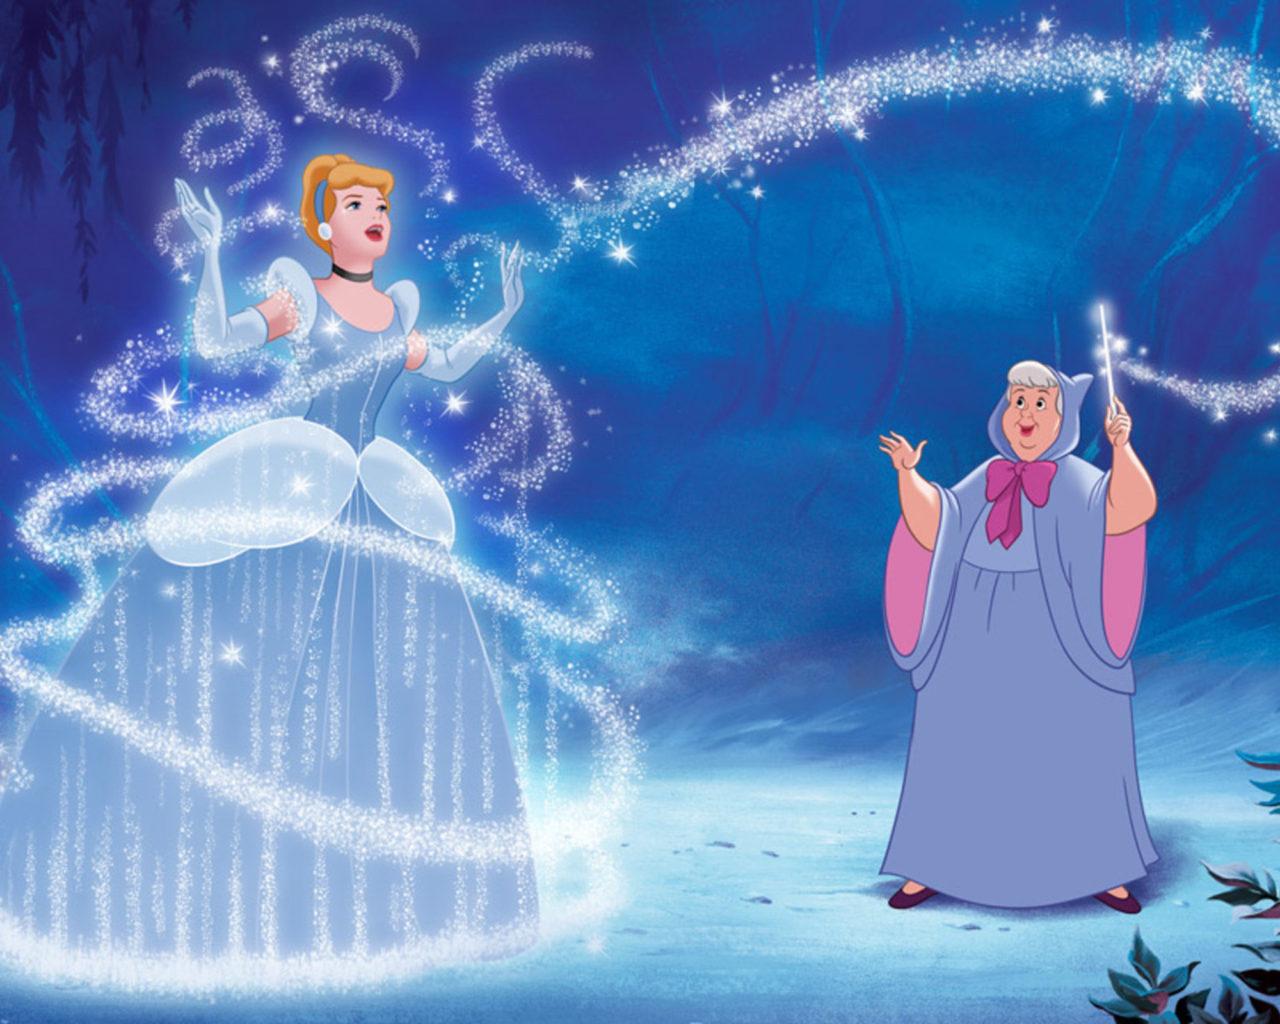 Hd Wallpaper Cars Disney A Cinderella Story Fairy Godmother Uses Magic Cinderella